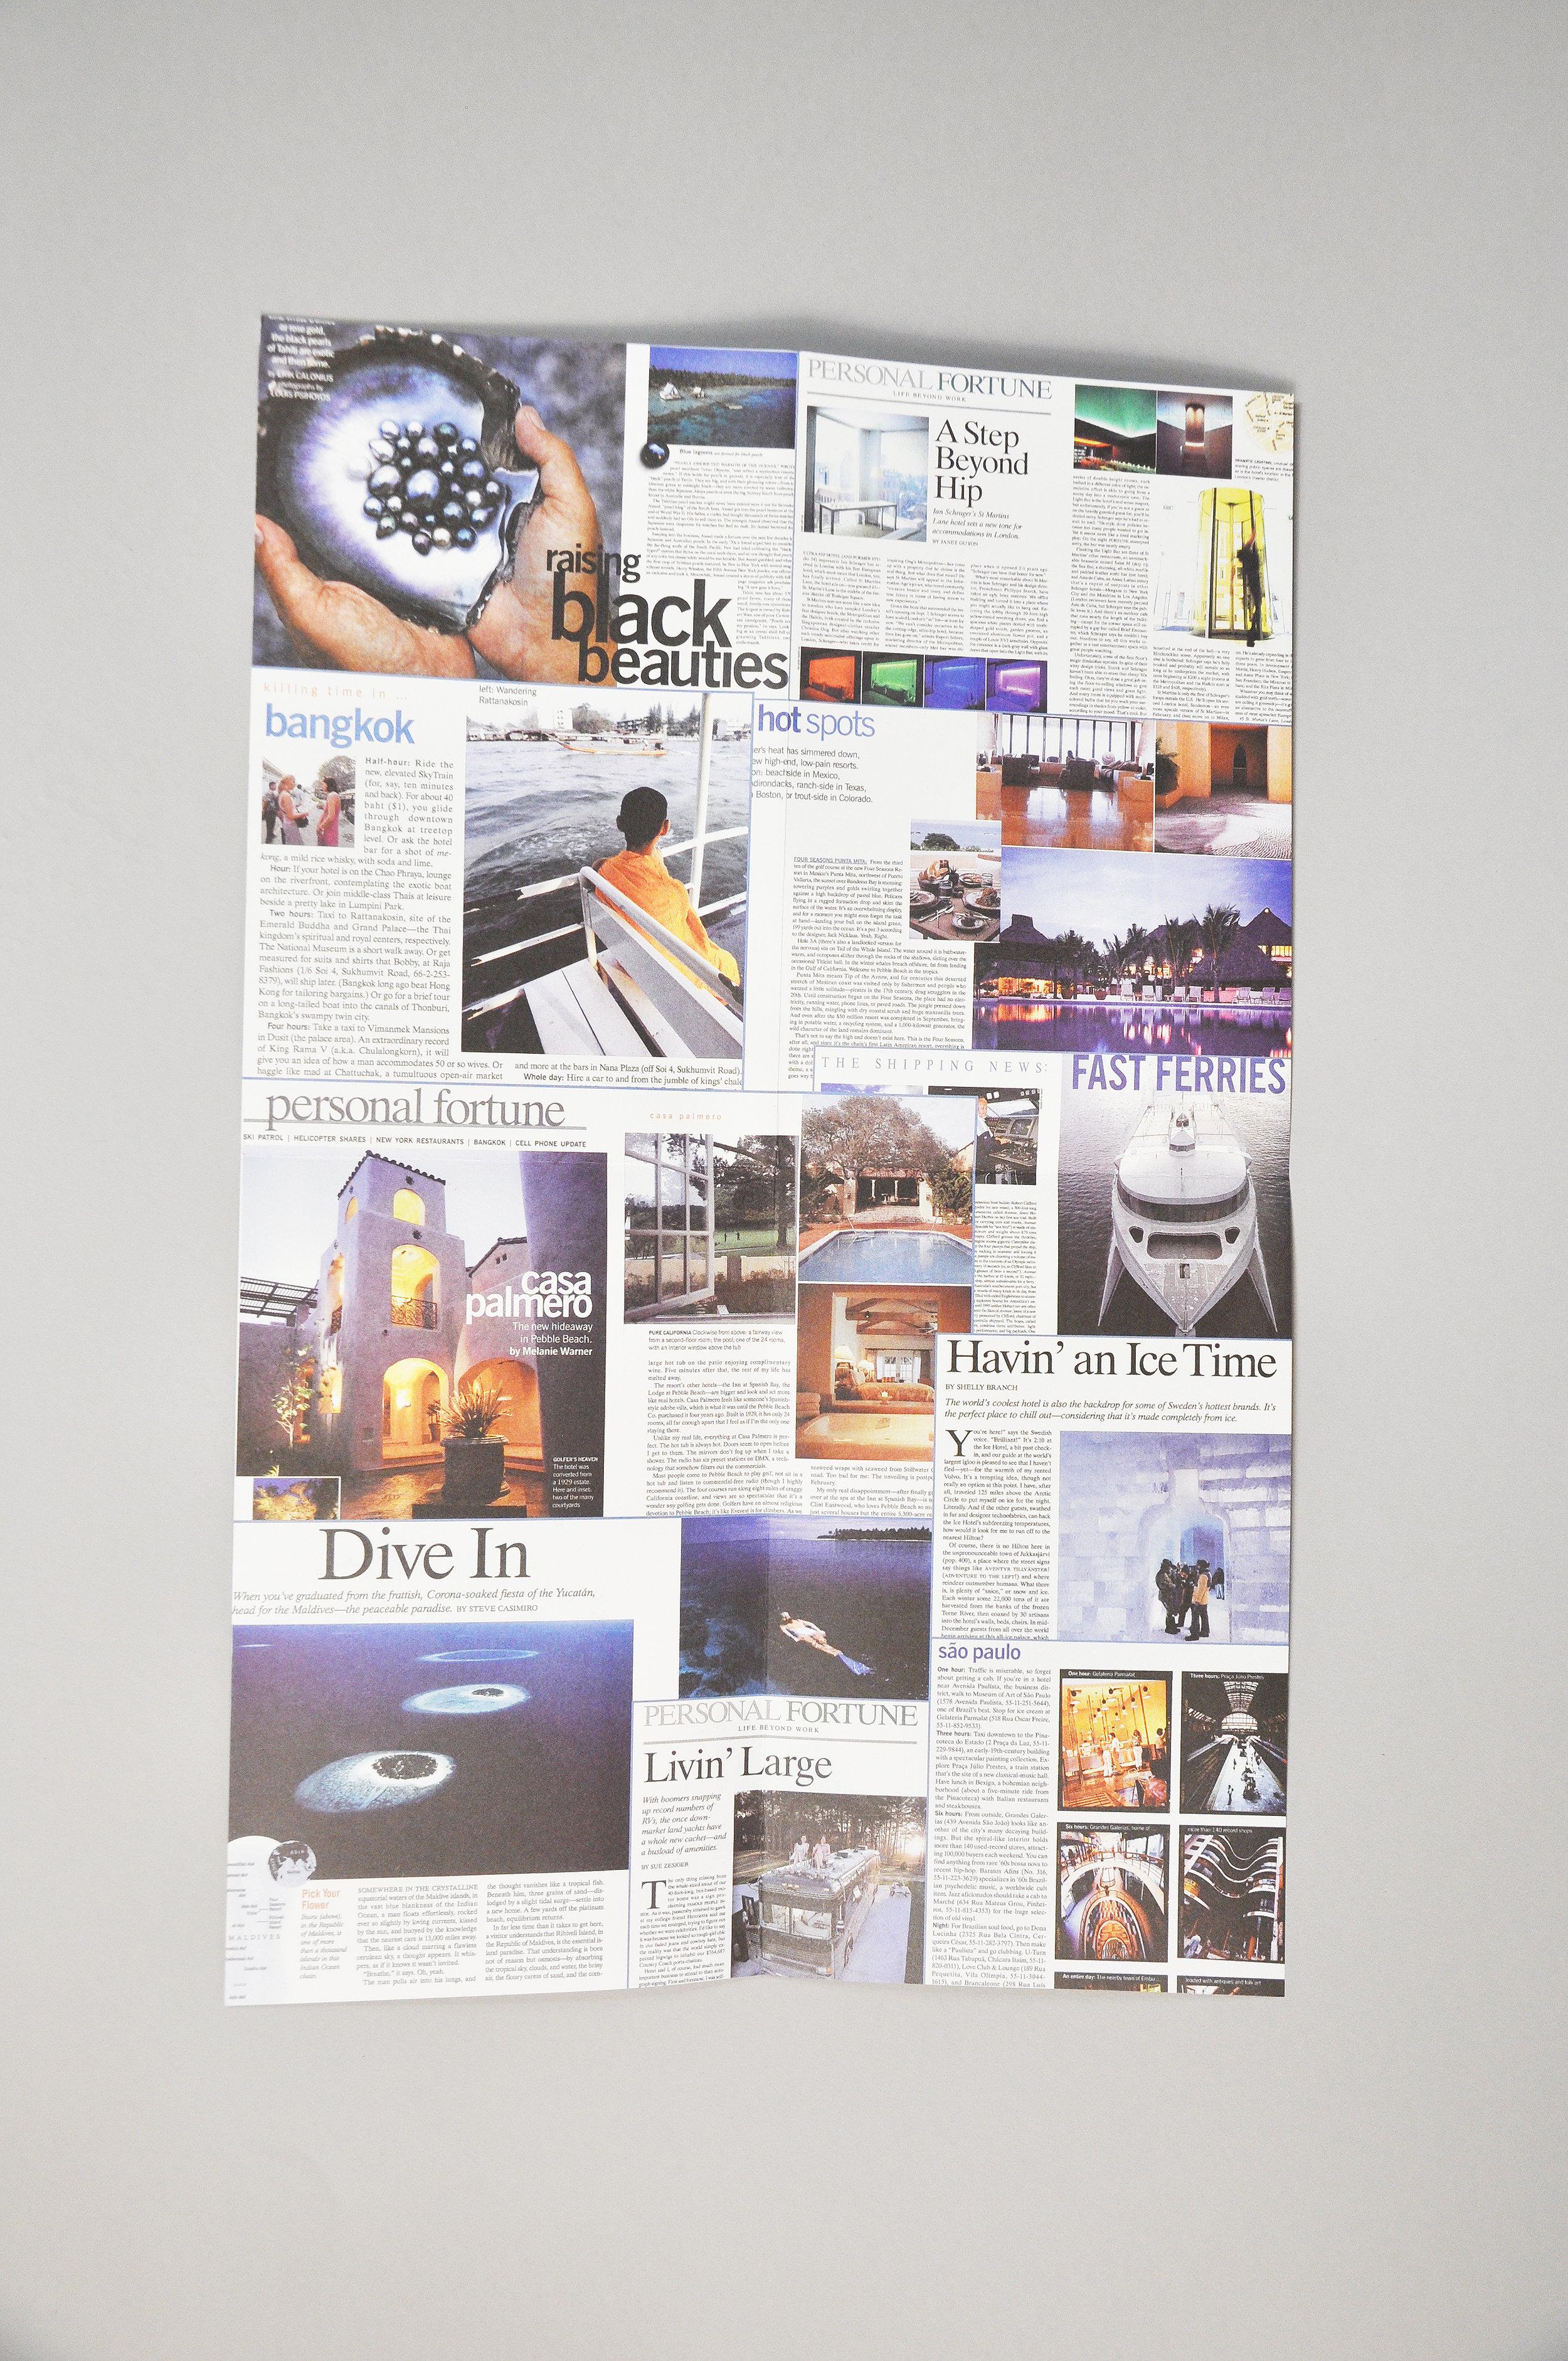 Travel Brochure single page spread design